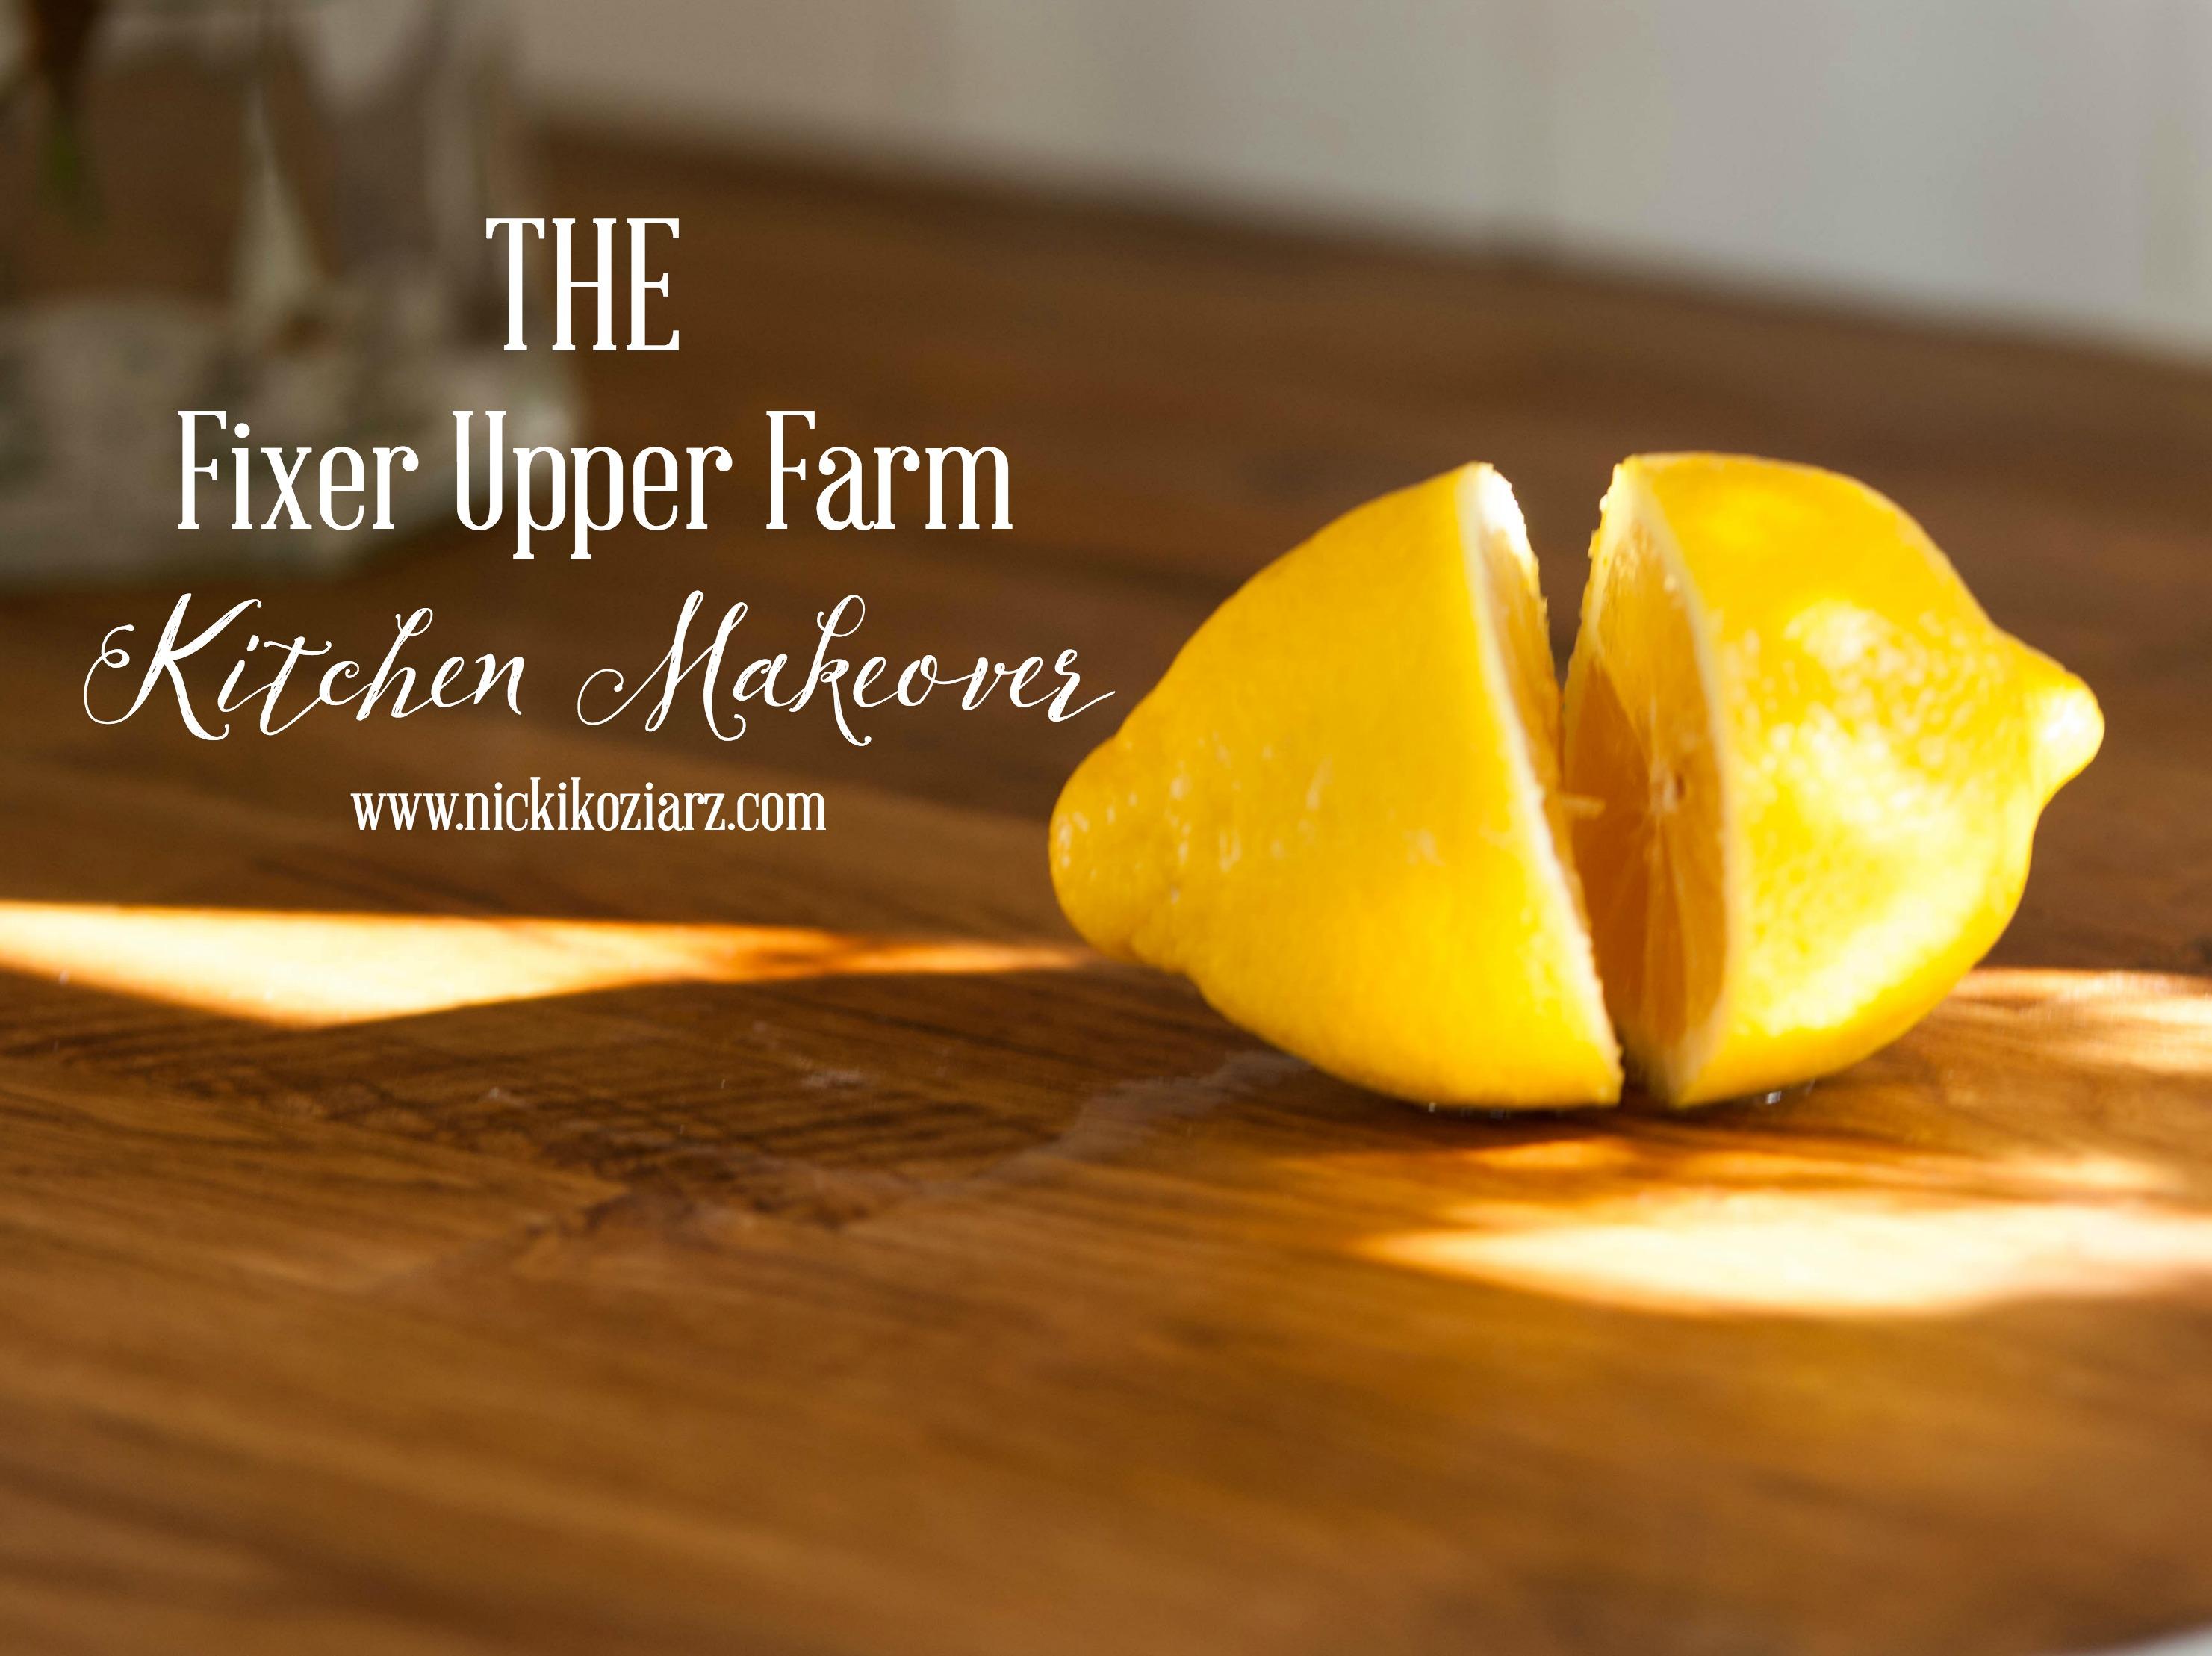 Fixer upper kitchen makeovers - Kitchenmakeovergraphic